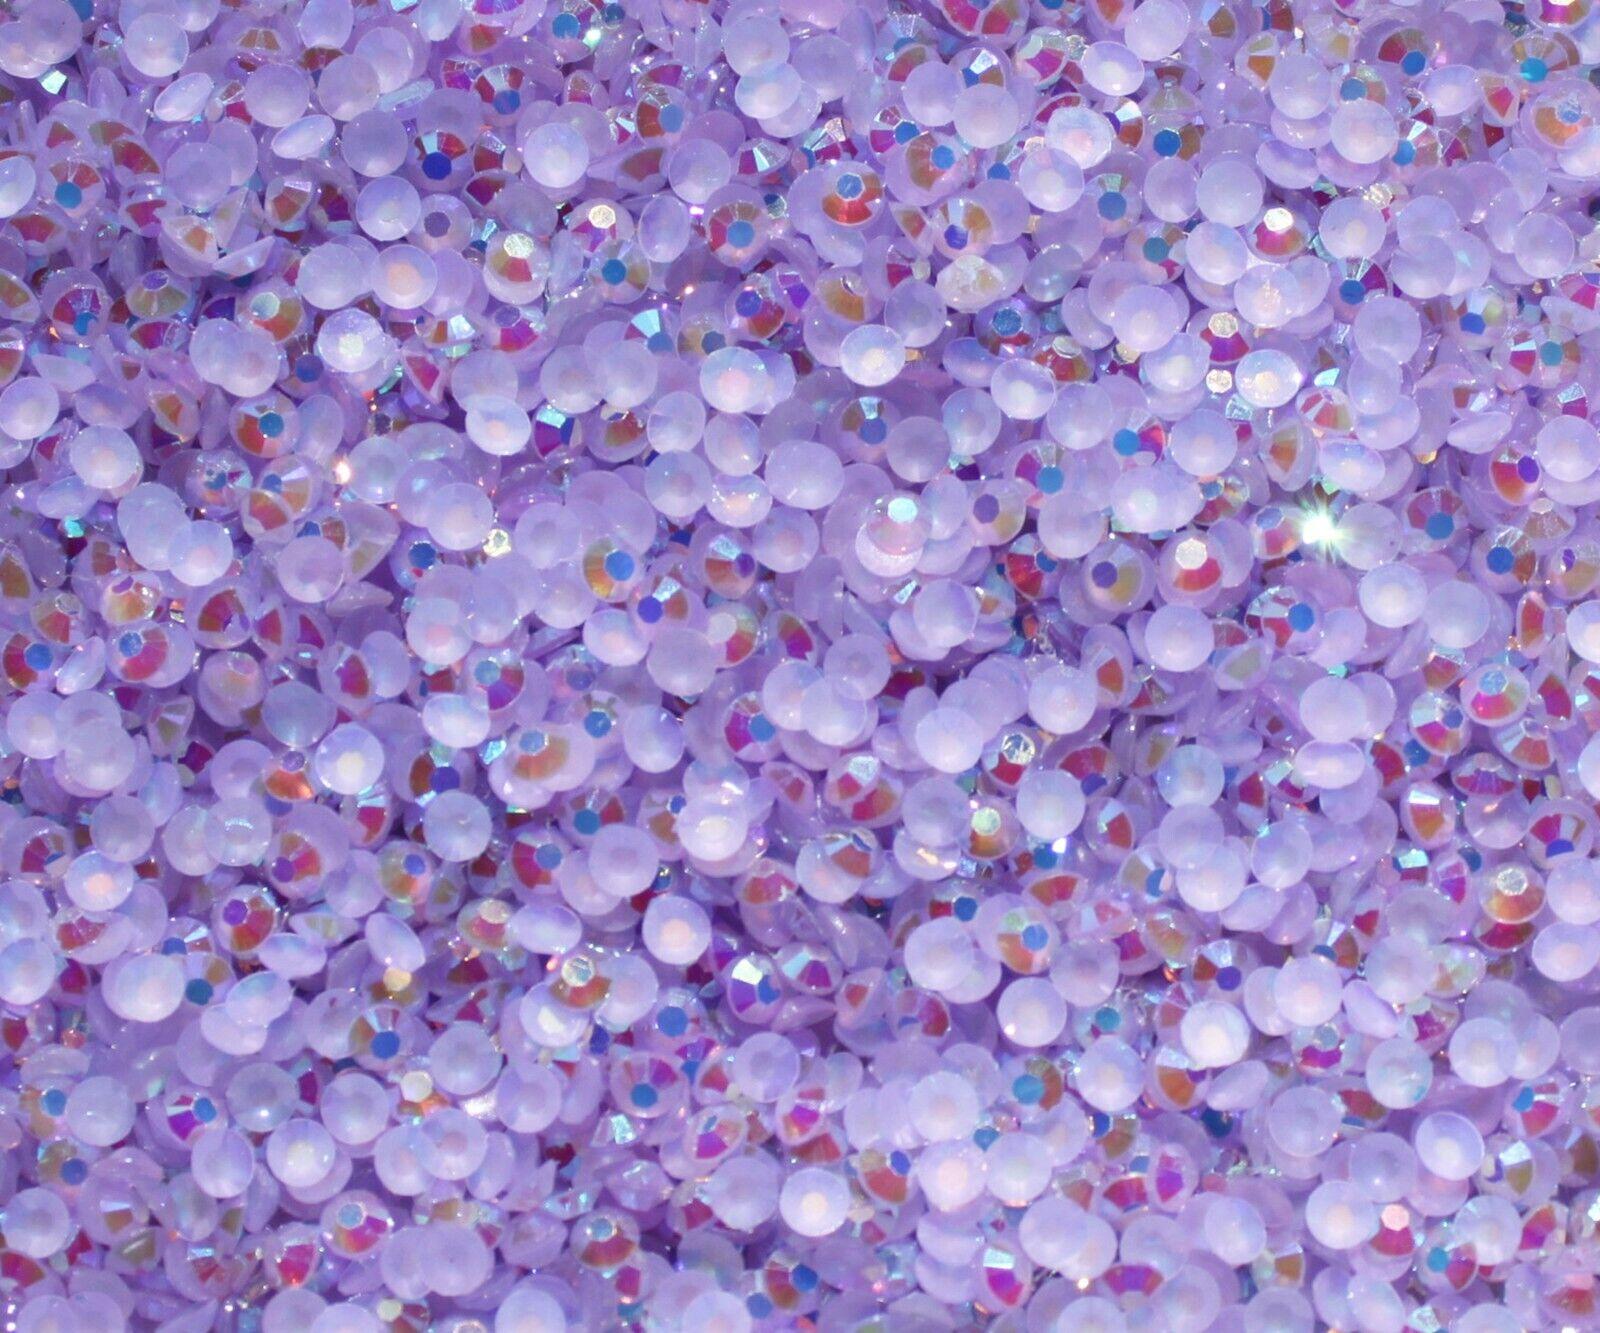 1000 Crystal Flat Back Resin Rhinestones Gems 60 colors, 2mm, 3mm, 4mm, 5mm, 6.5 LIGHT PURPLE AB